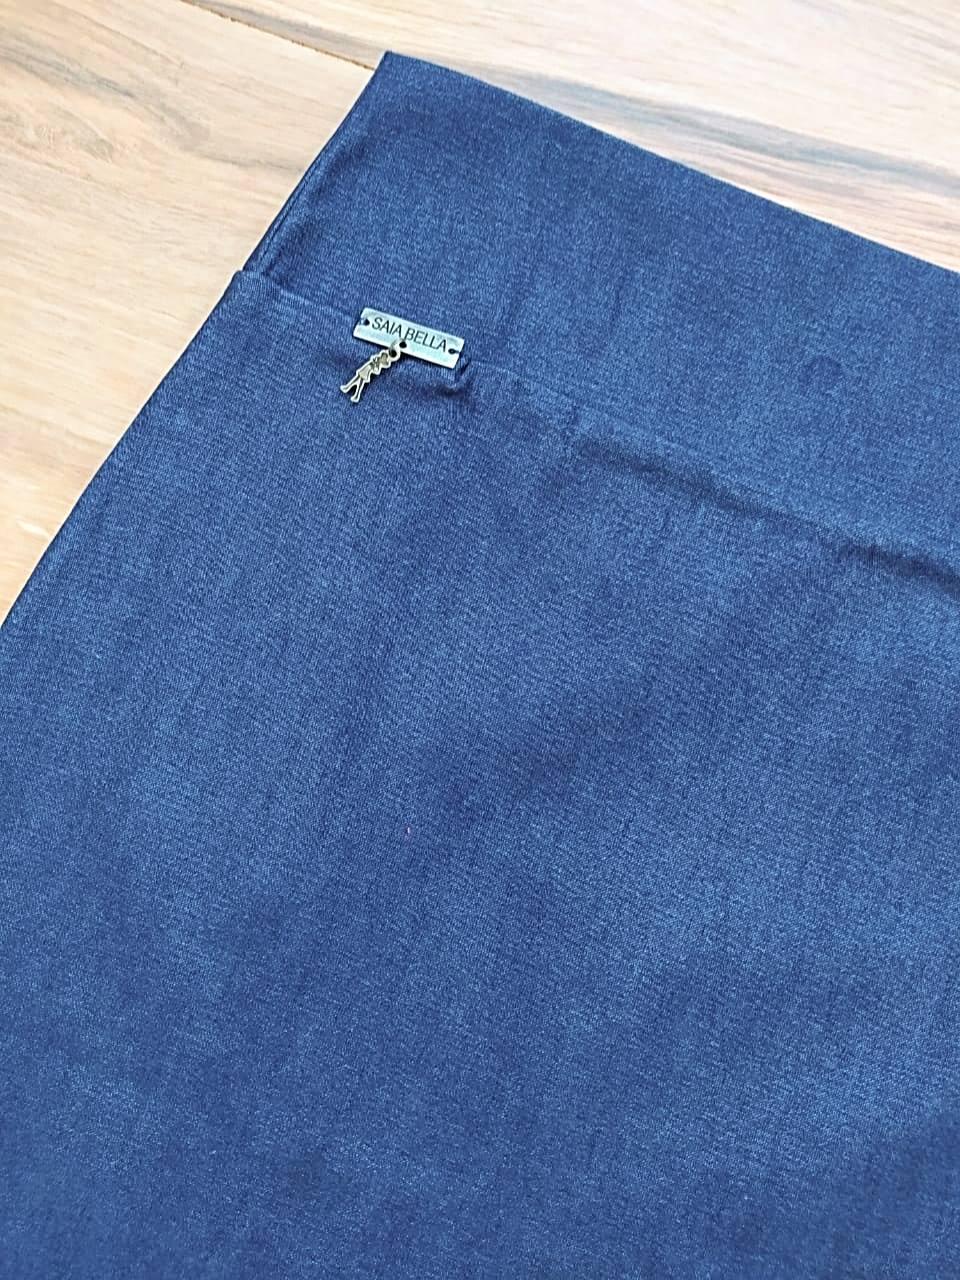 Saia Laura Modelo Lápis  Saia Bella SB858 Jeans